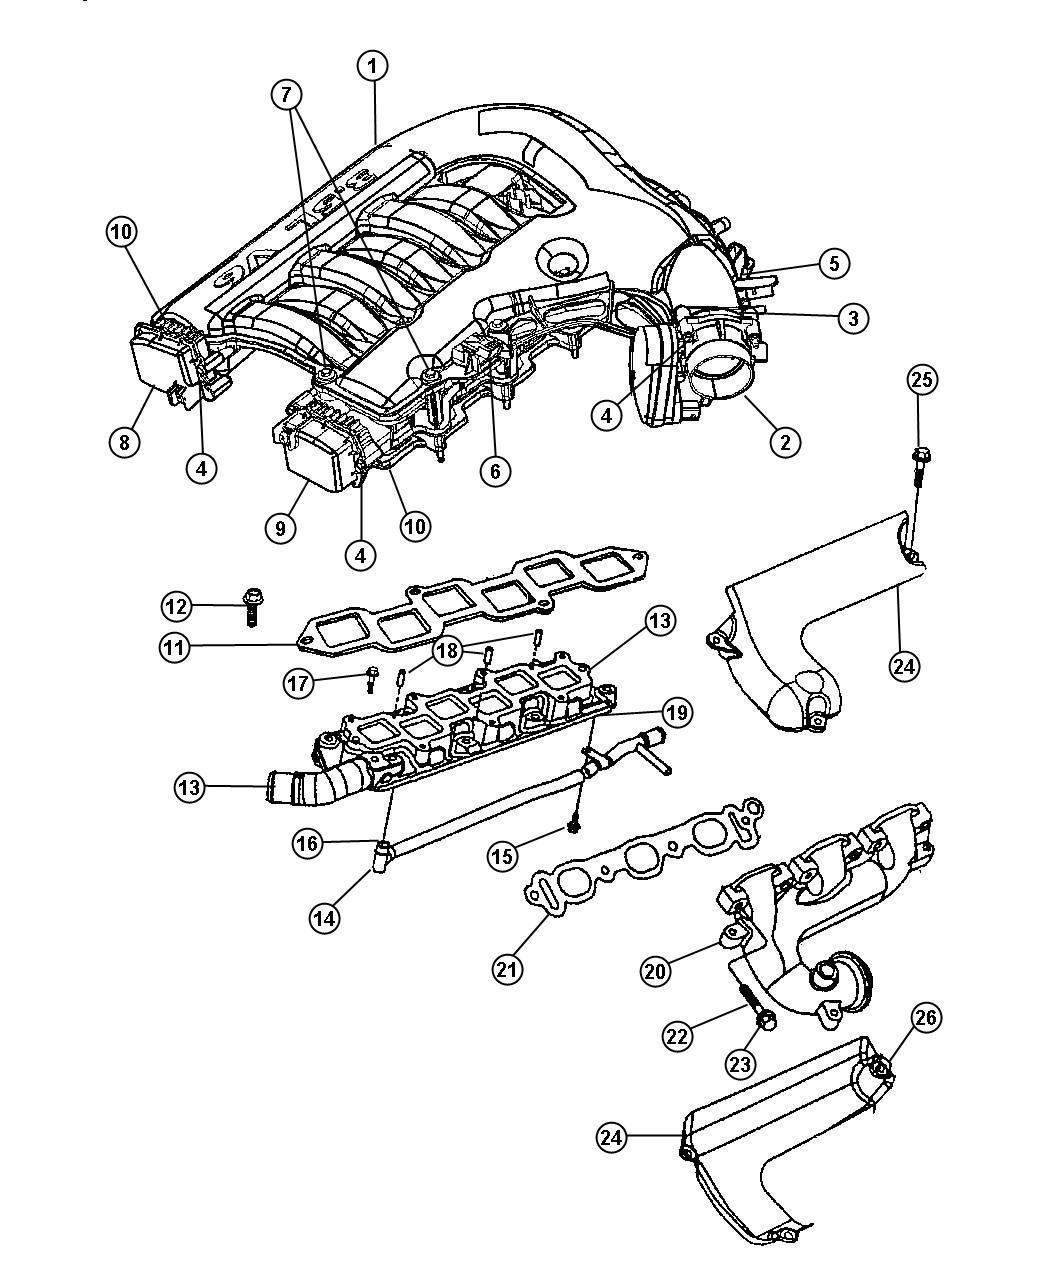 2007 Dodge Magnum Actuator. Intake short running valve